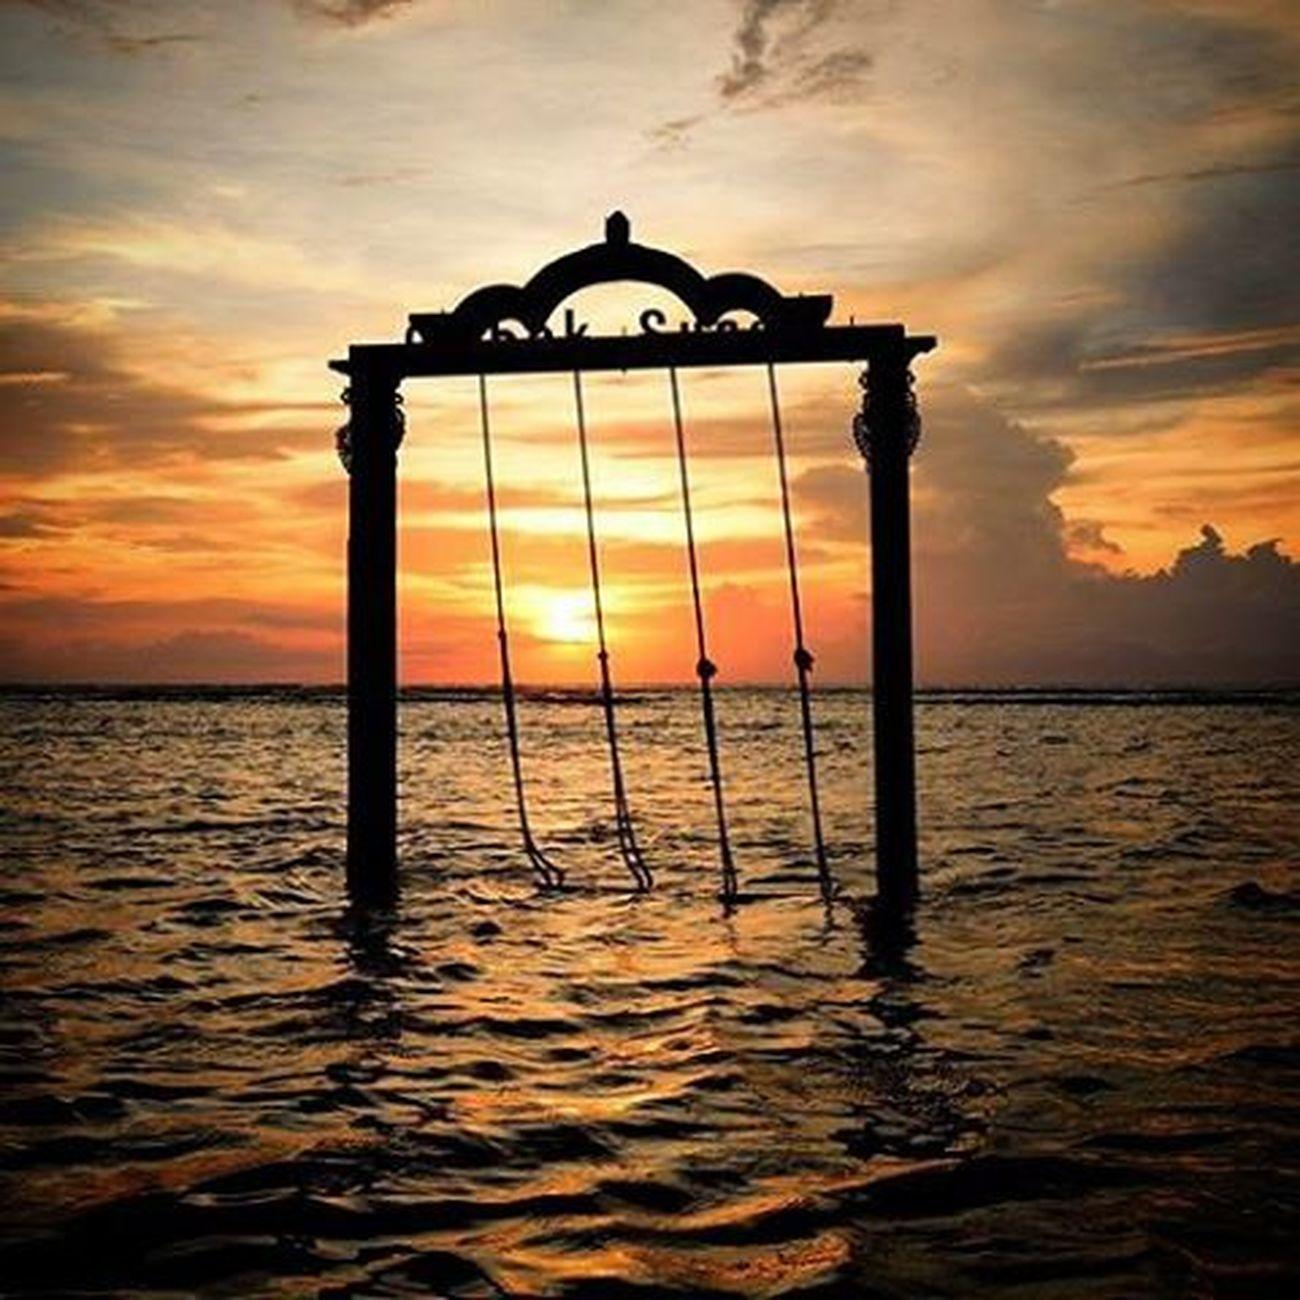 Ombak Sunset swings on Gili T. Sunset INDONESIA Anotherhorizon Swings Gilitrawangan  Beach Ocean Traveleverydamnday Bintang Wanderlust